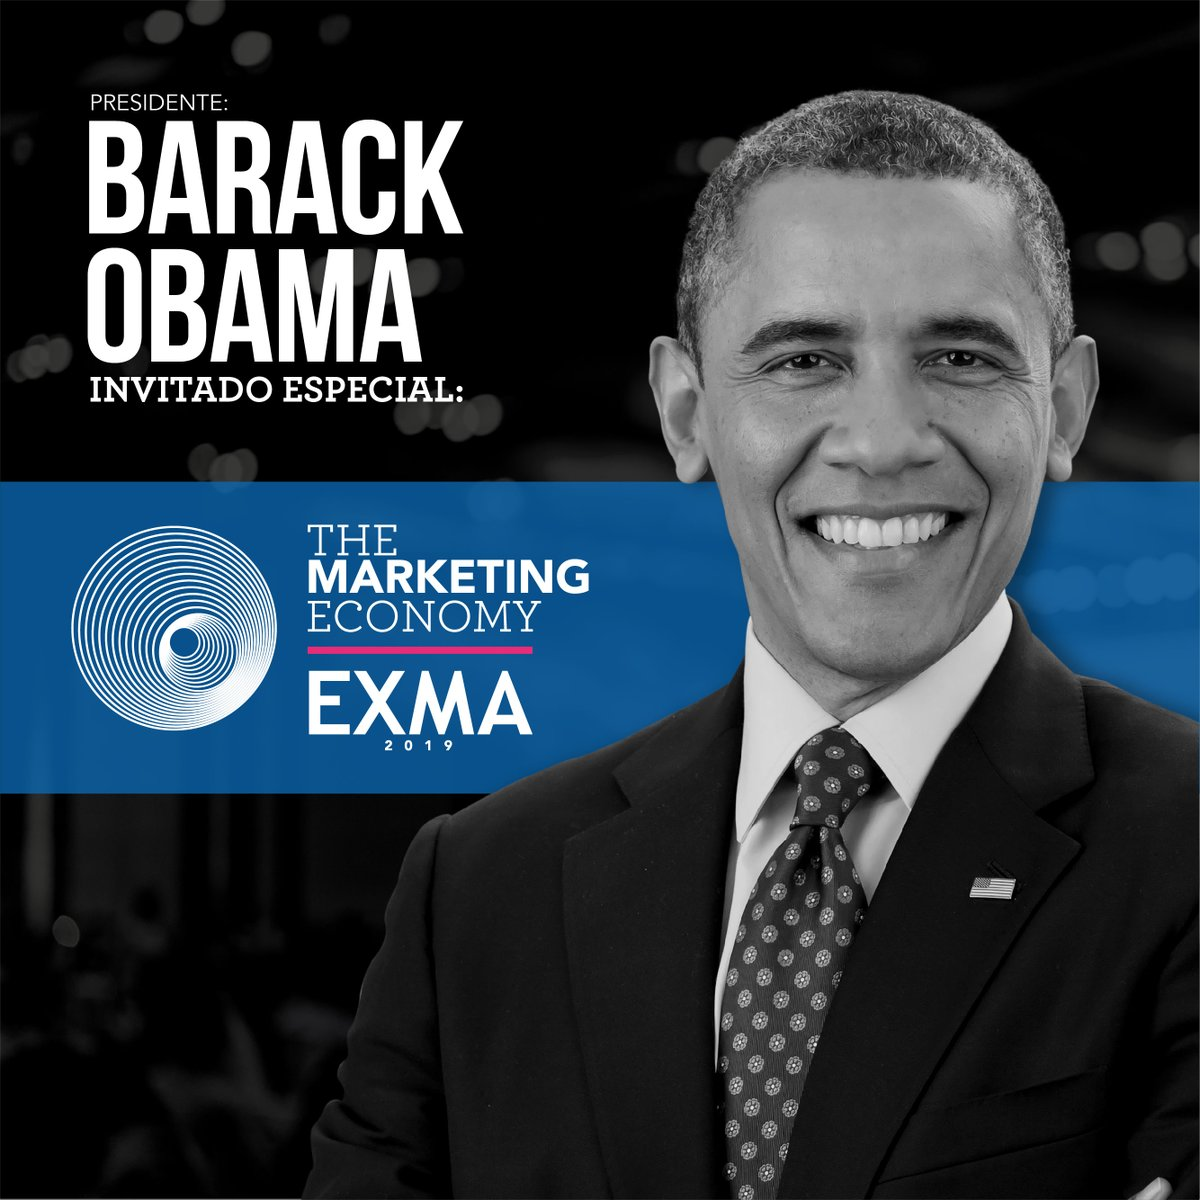 Barack Obama visita Colombia